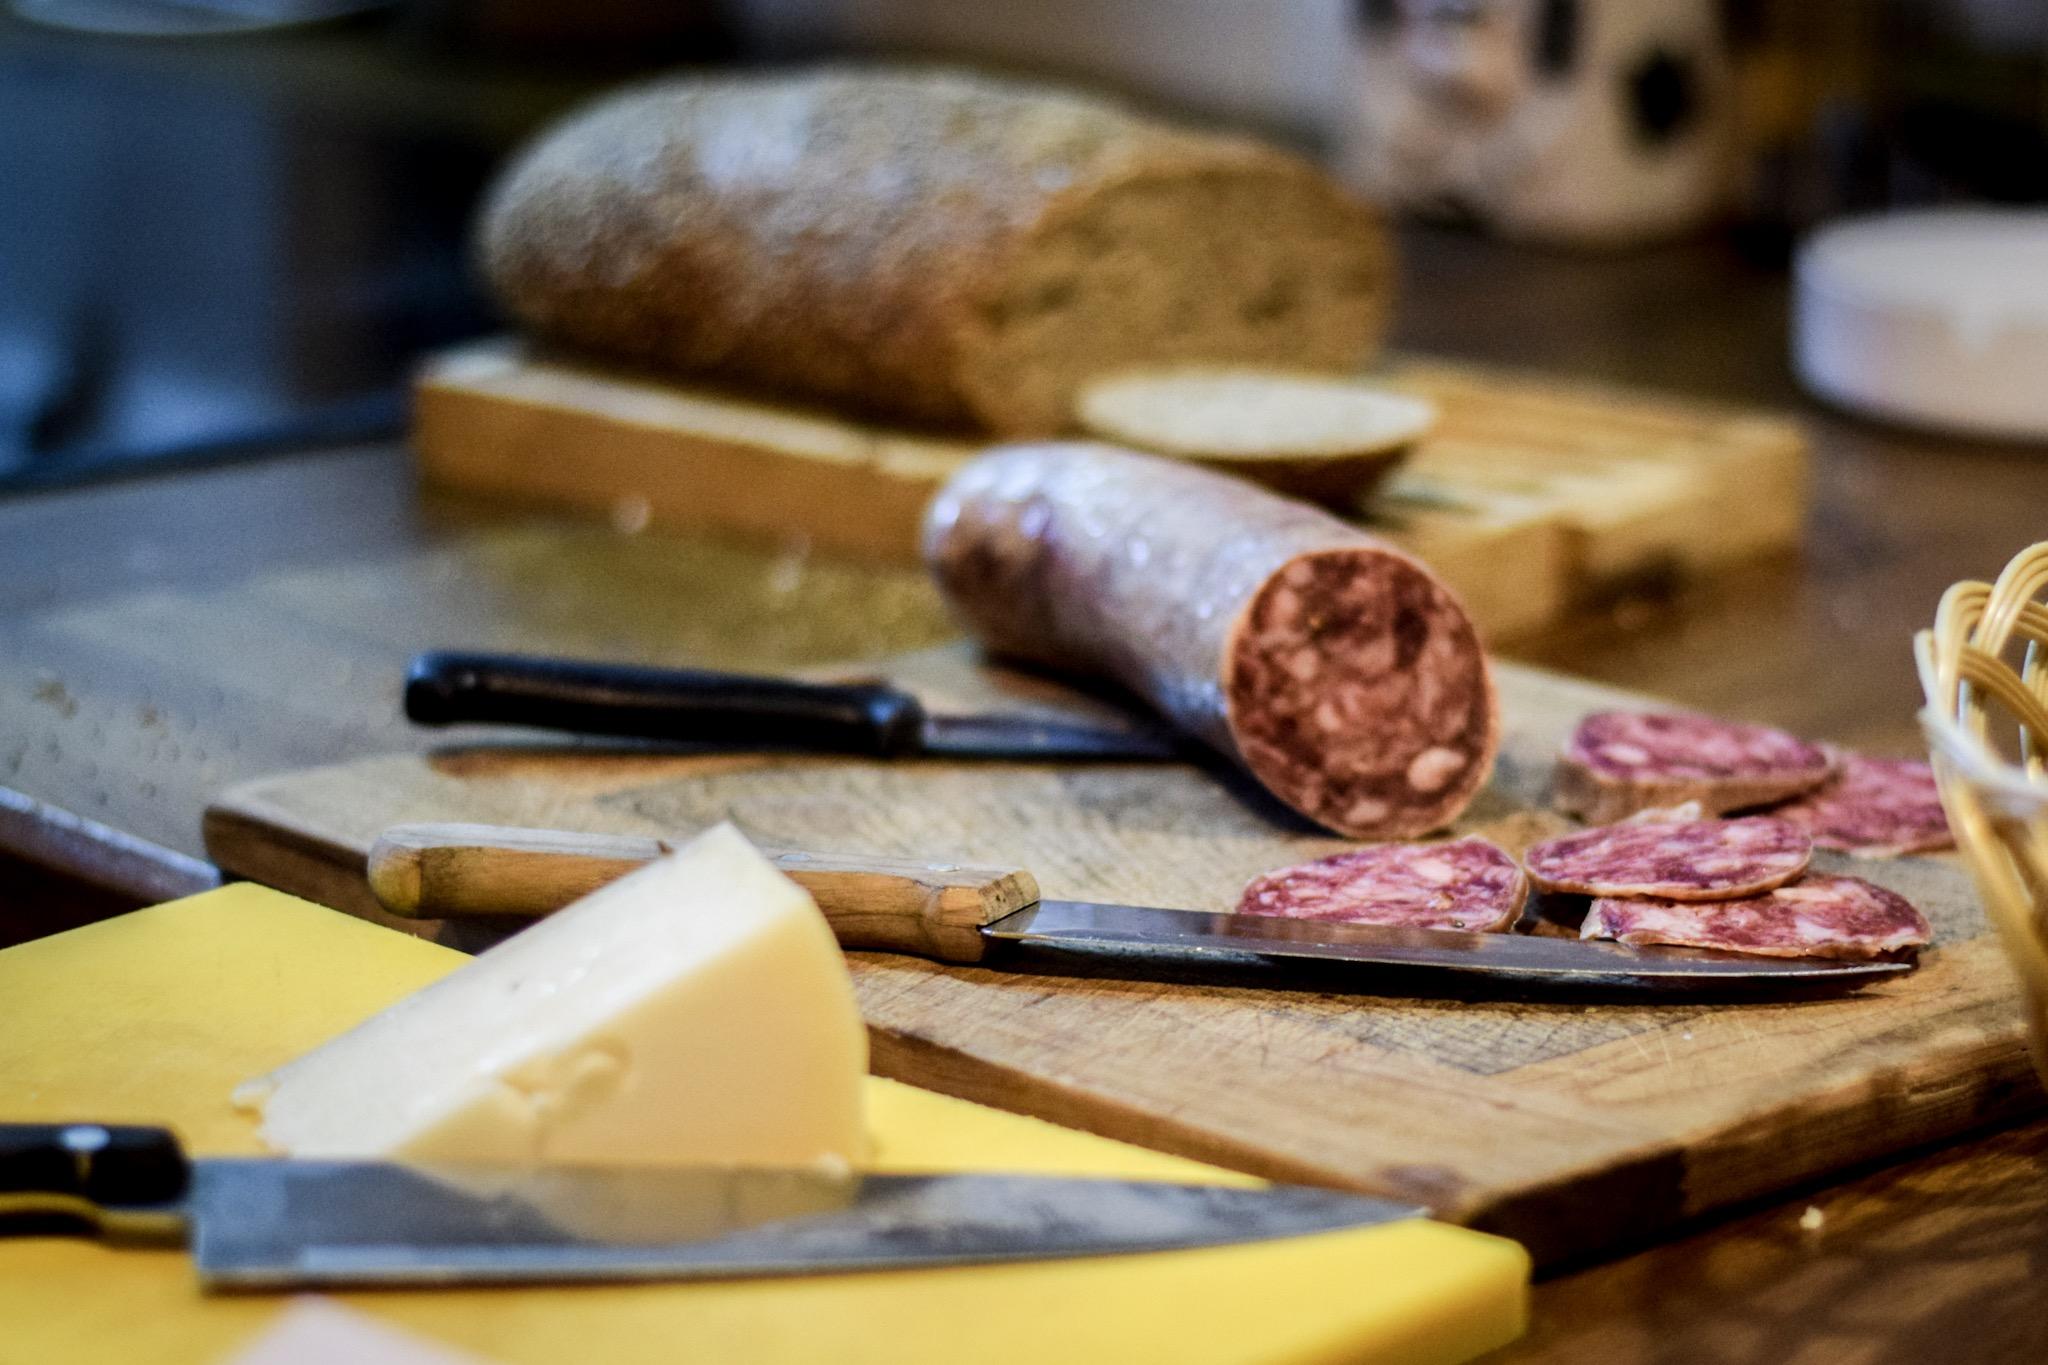 Chorizo and Spanish cheese at Bodegas Vidular in Cantabria, northern Spain.